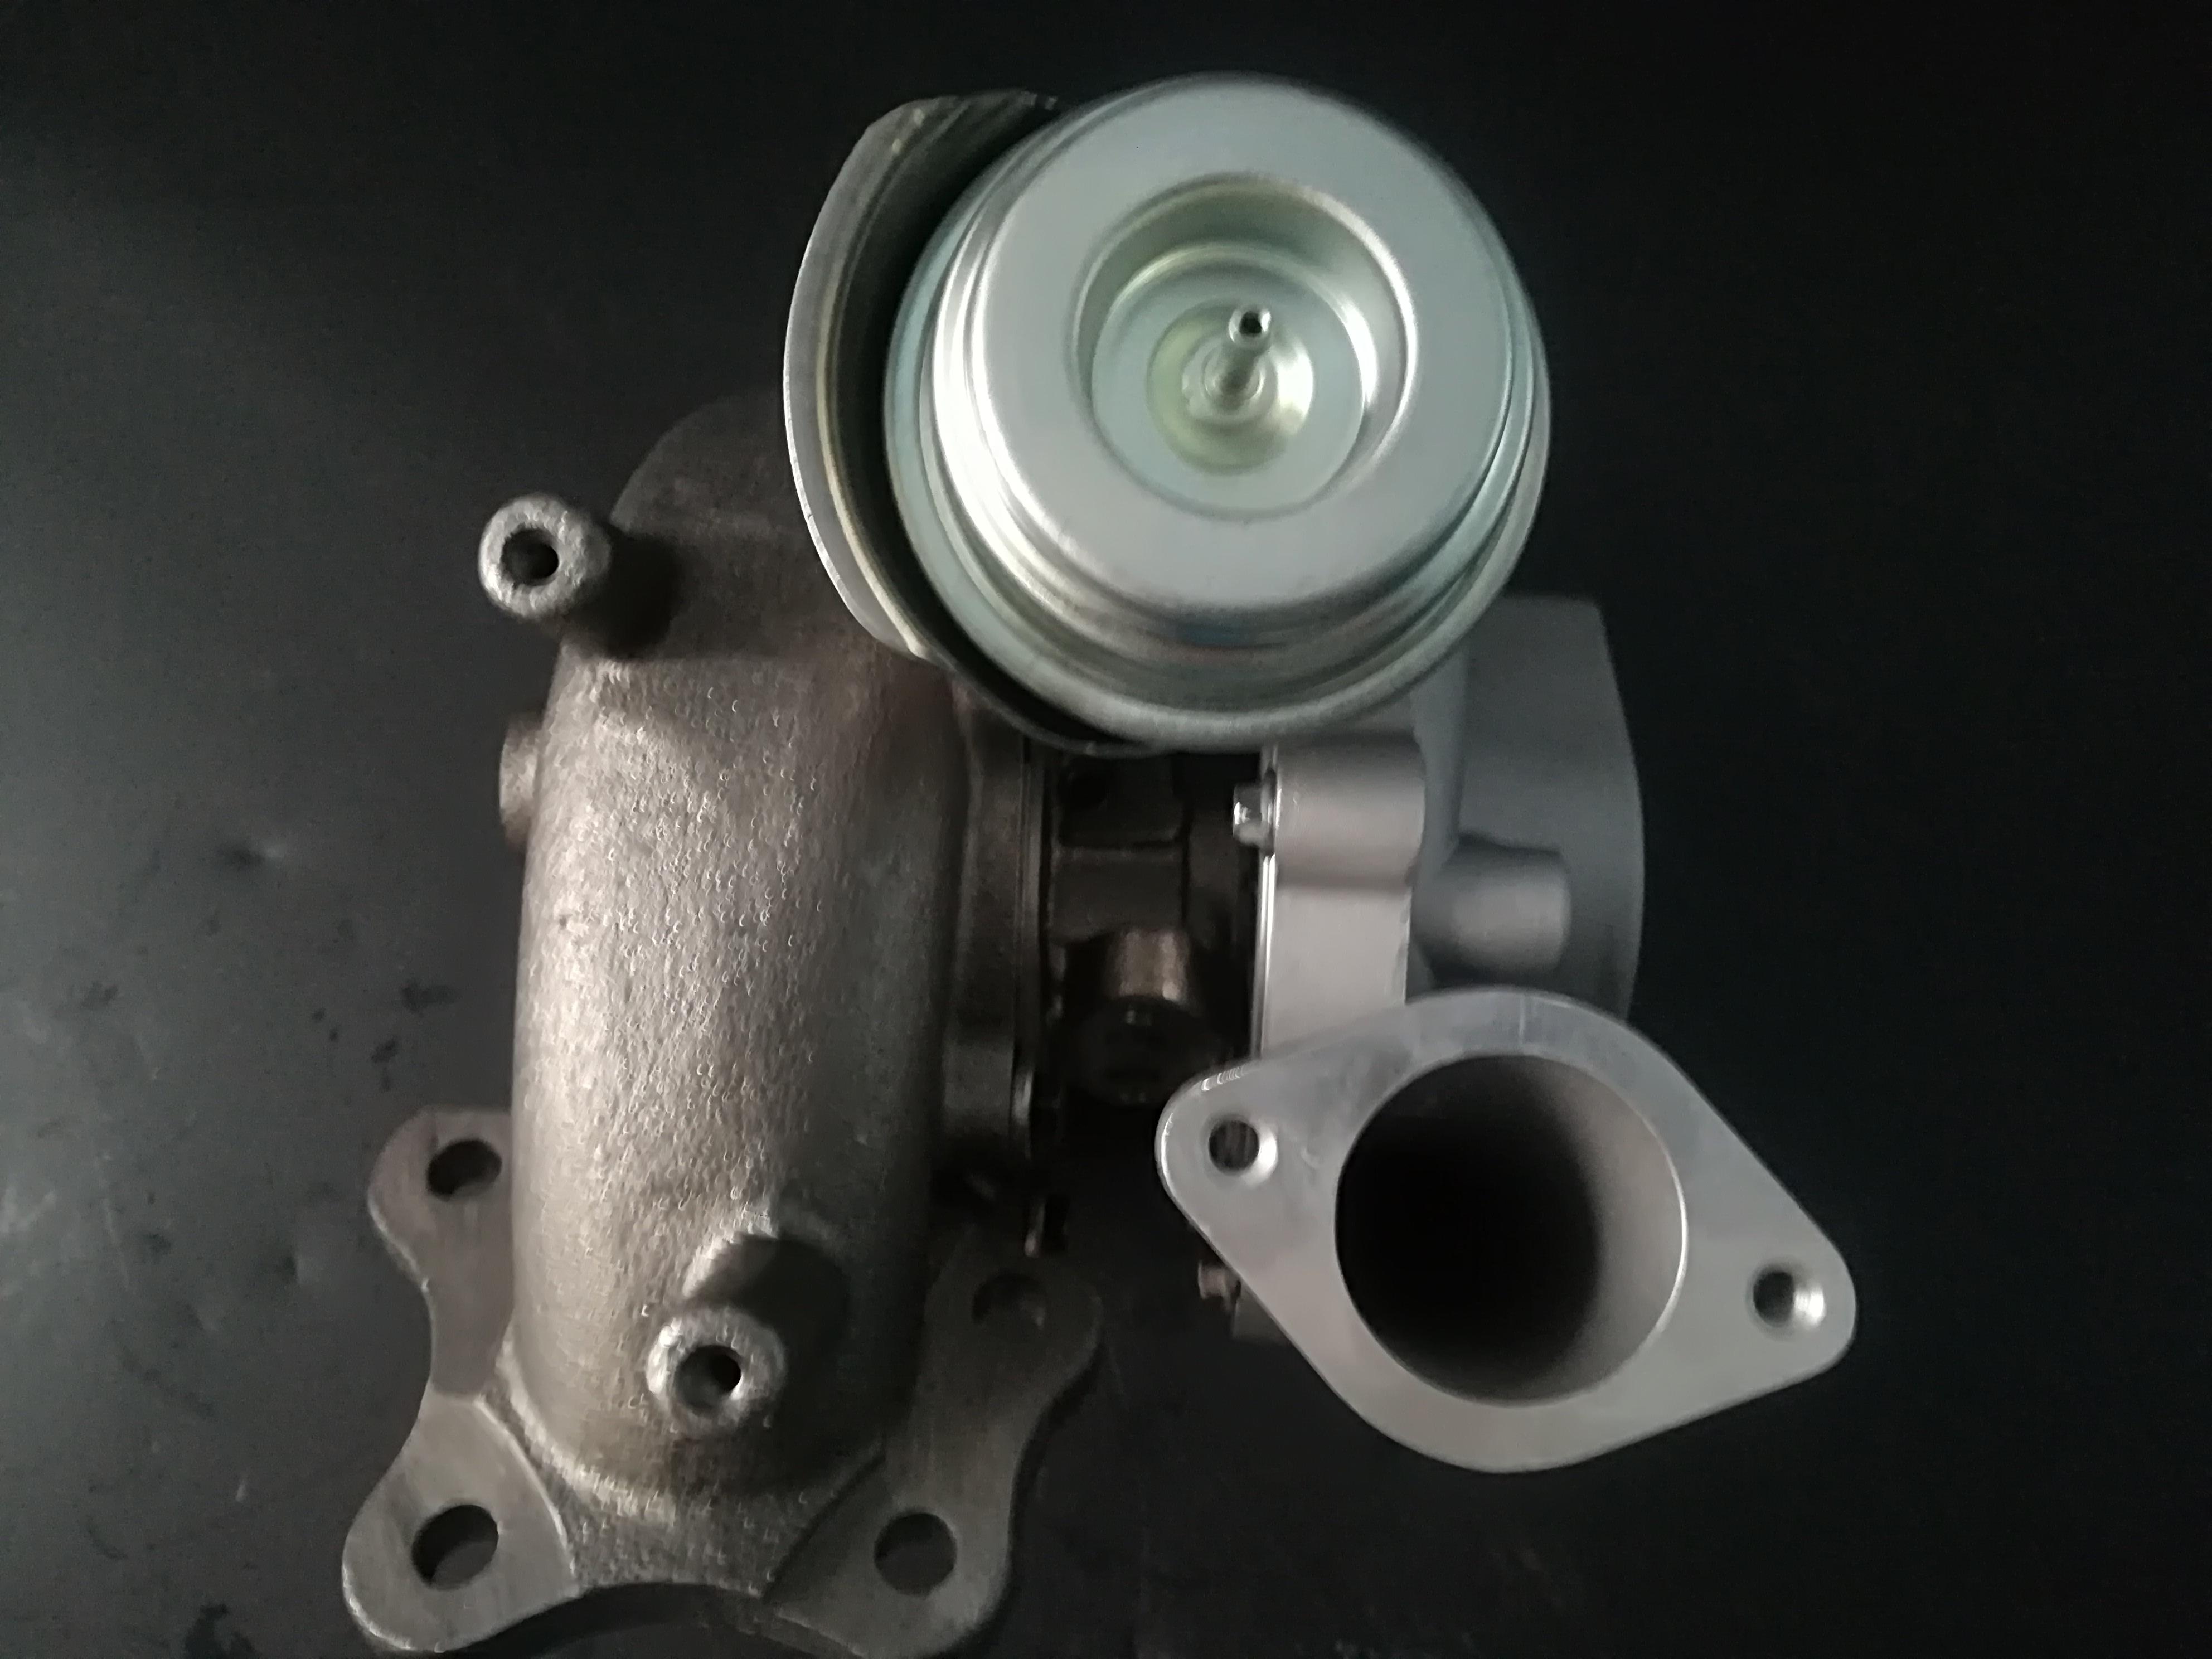 GT2056V 767720-5005S 767720 Turbocharger 14411EB71C 14411-EB70C For Nissan Navara 2.5 DI 144 HP YD25